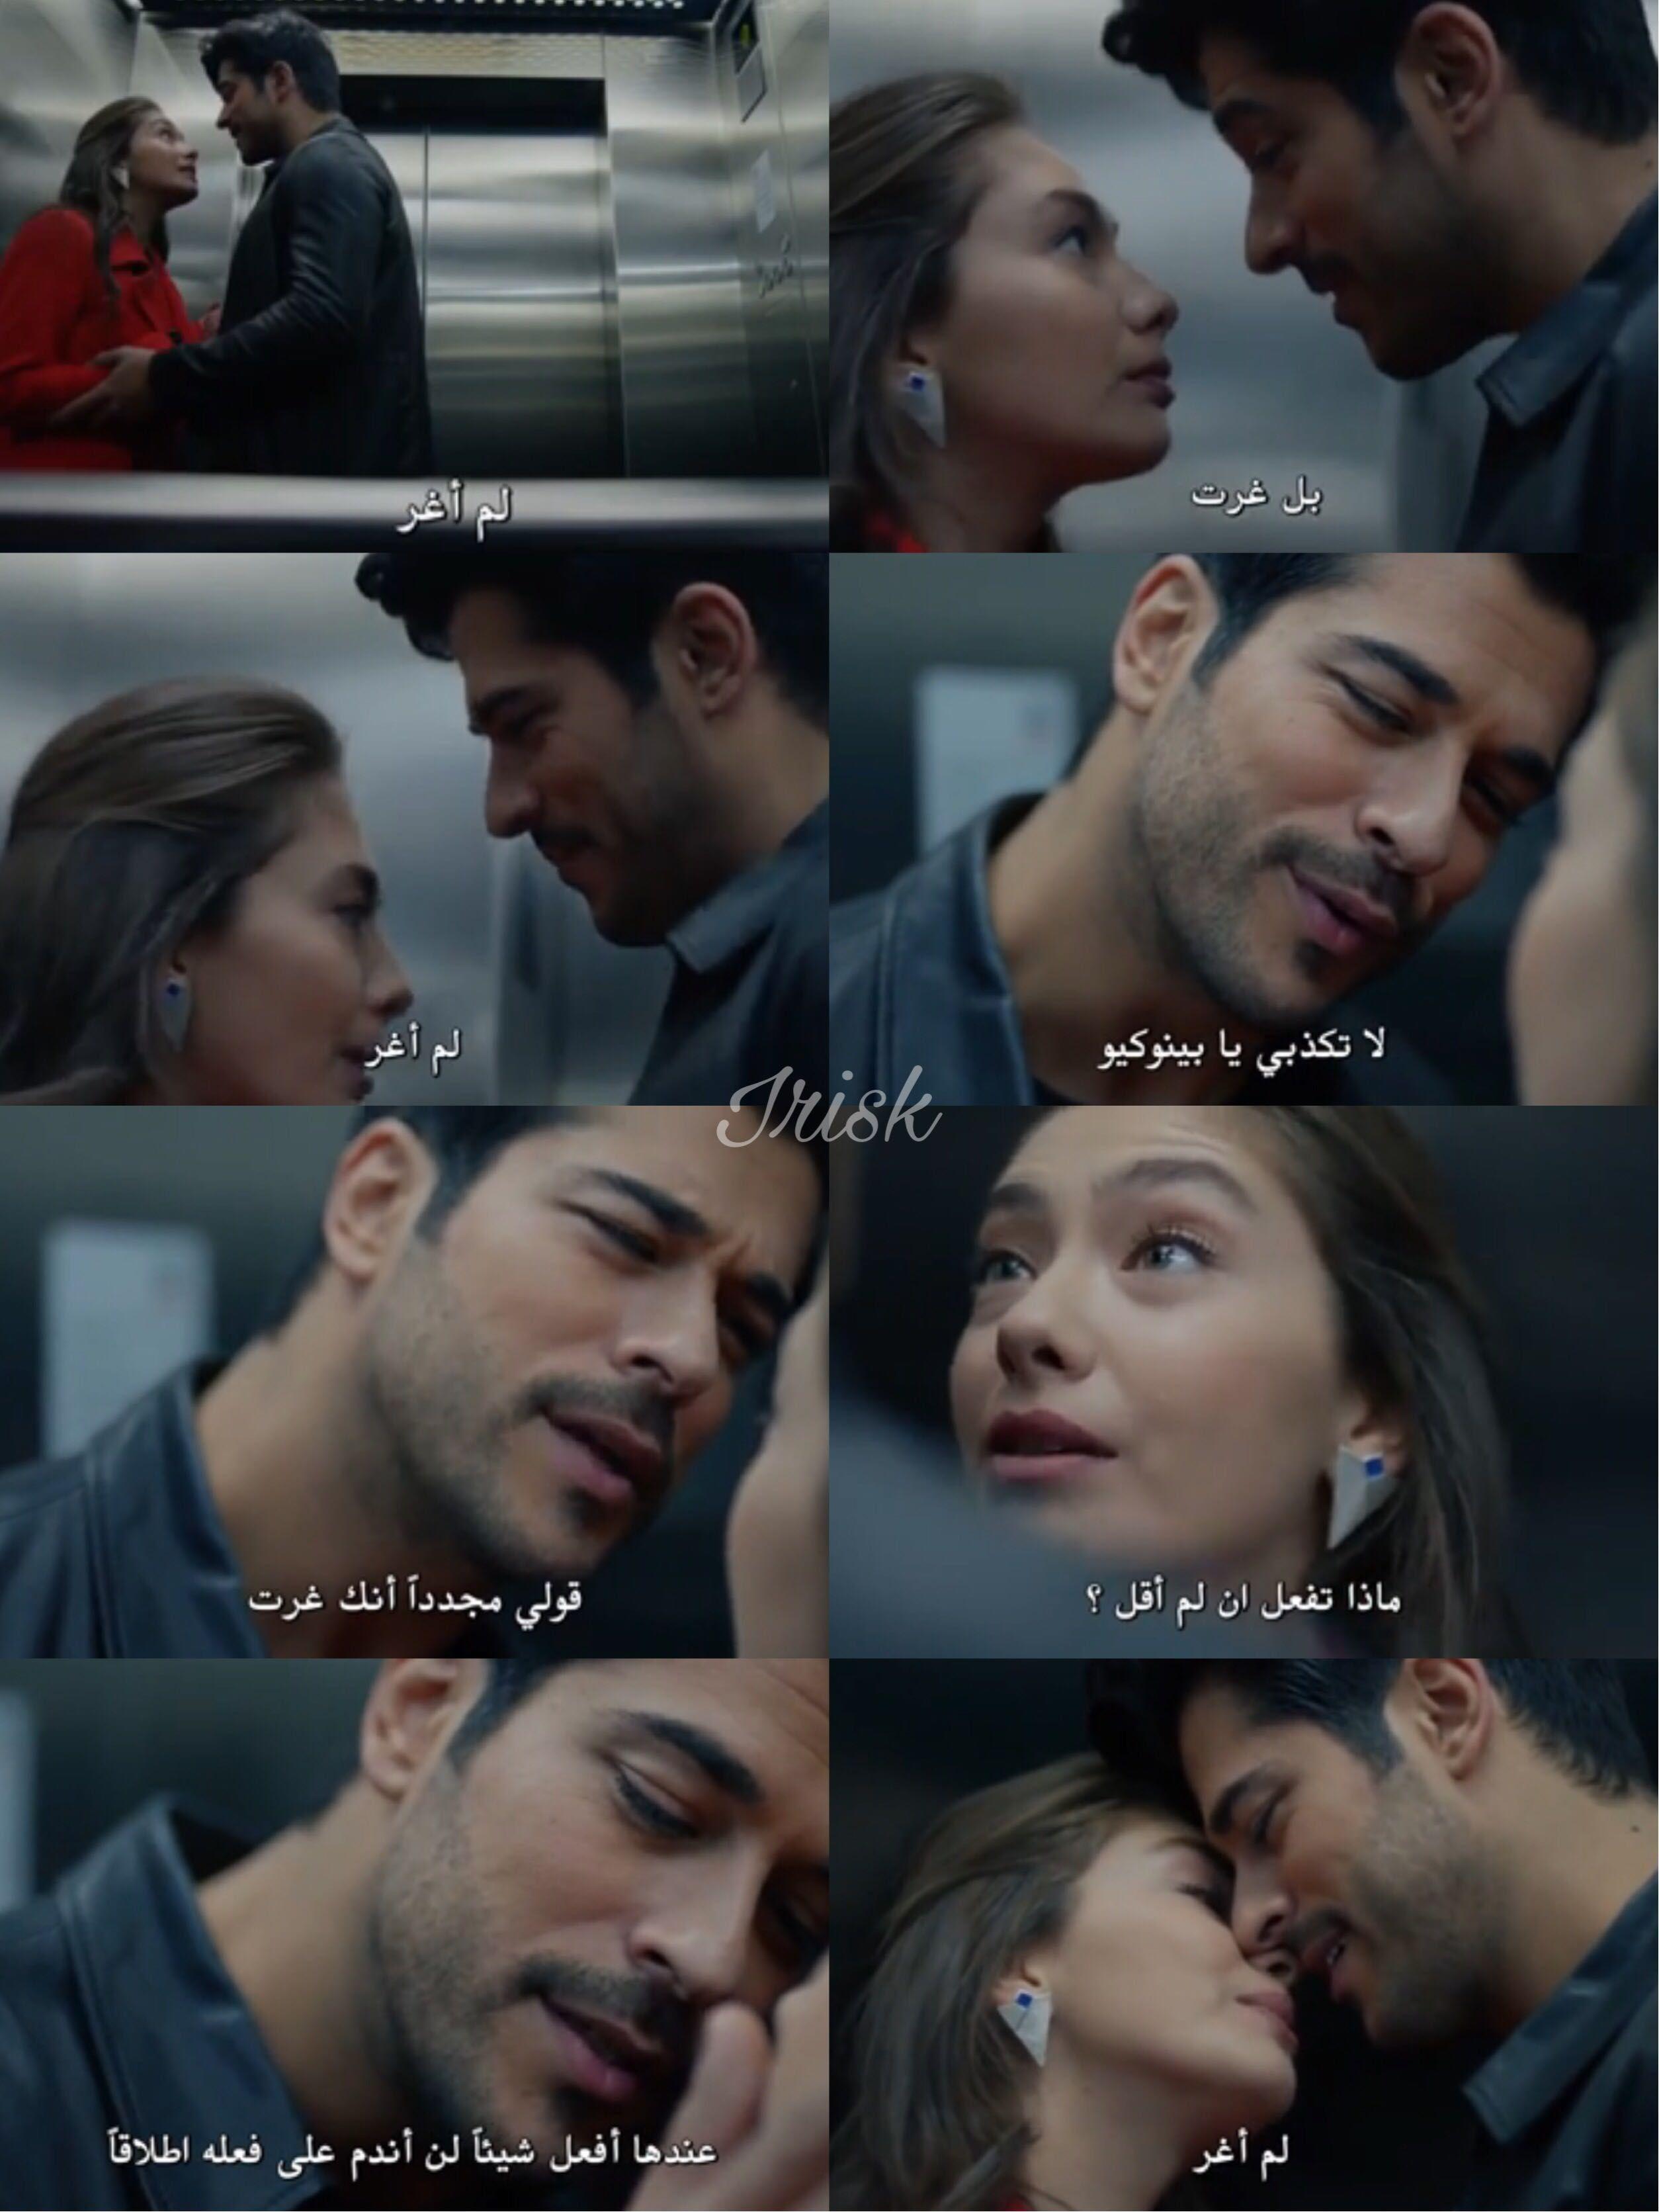 اجمل مشهد من الحلقة ٤٨ Kemal Ve Nihan Kara Sevda Cartoons Love Hot Actors Romantic Photography